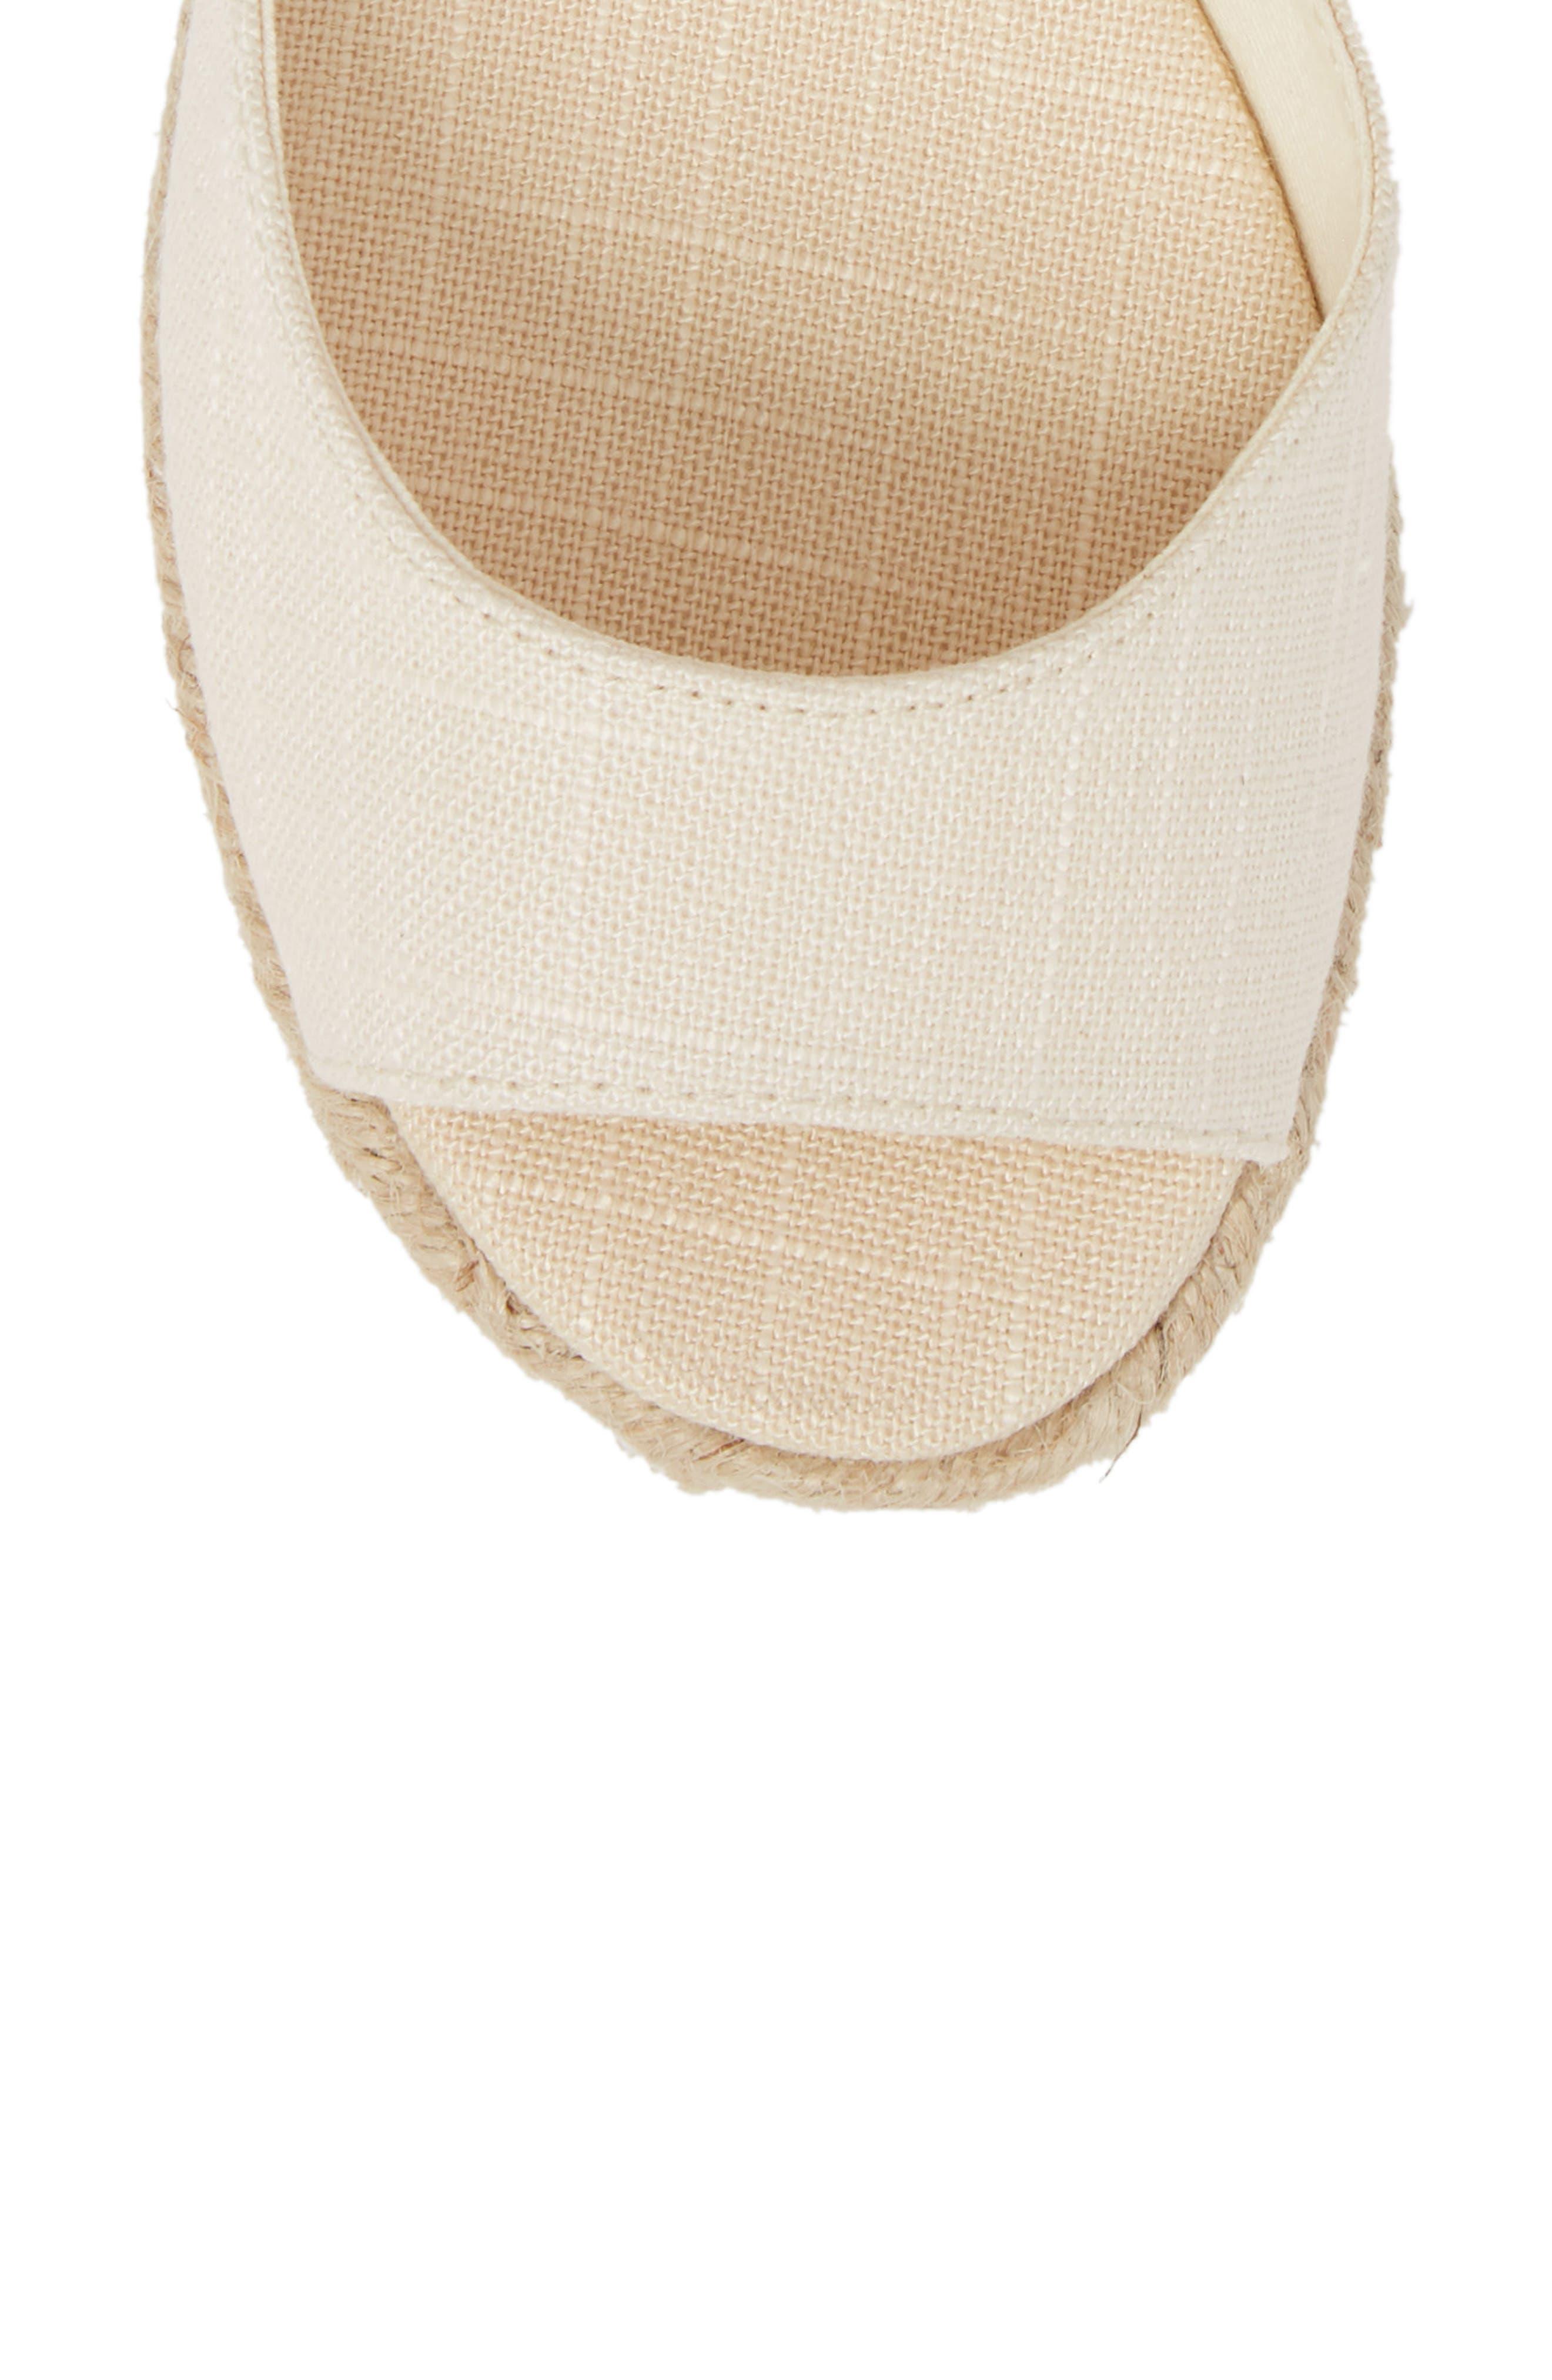 Espadrille Platform Sandal,                             Alternate thumbnail 5, color,                             Blush Fabric